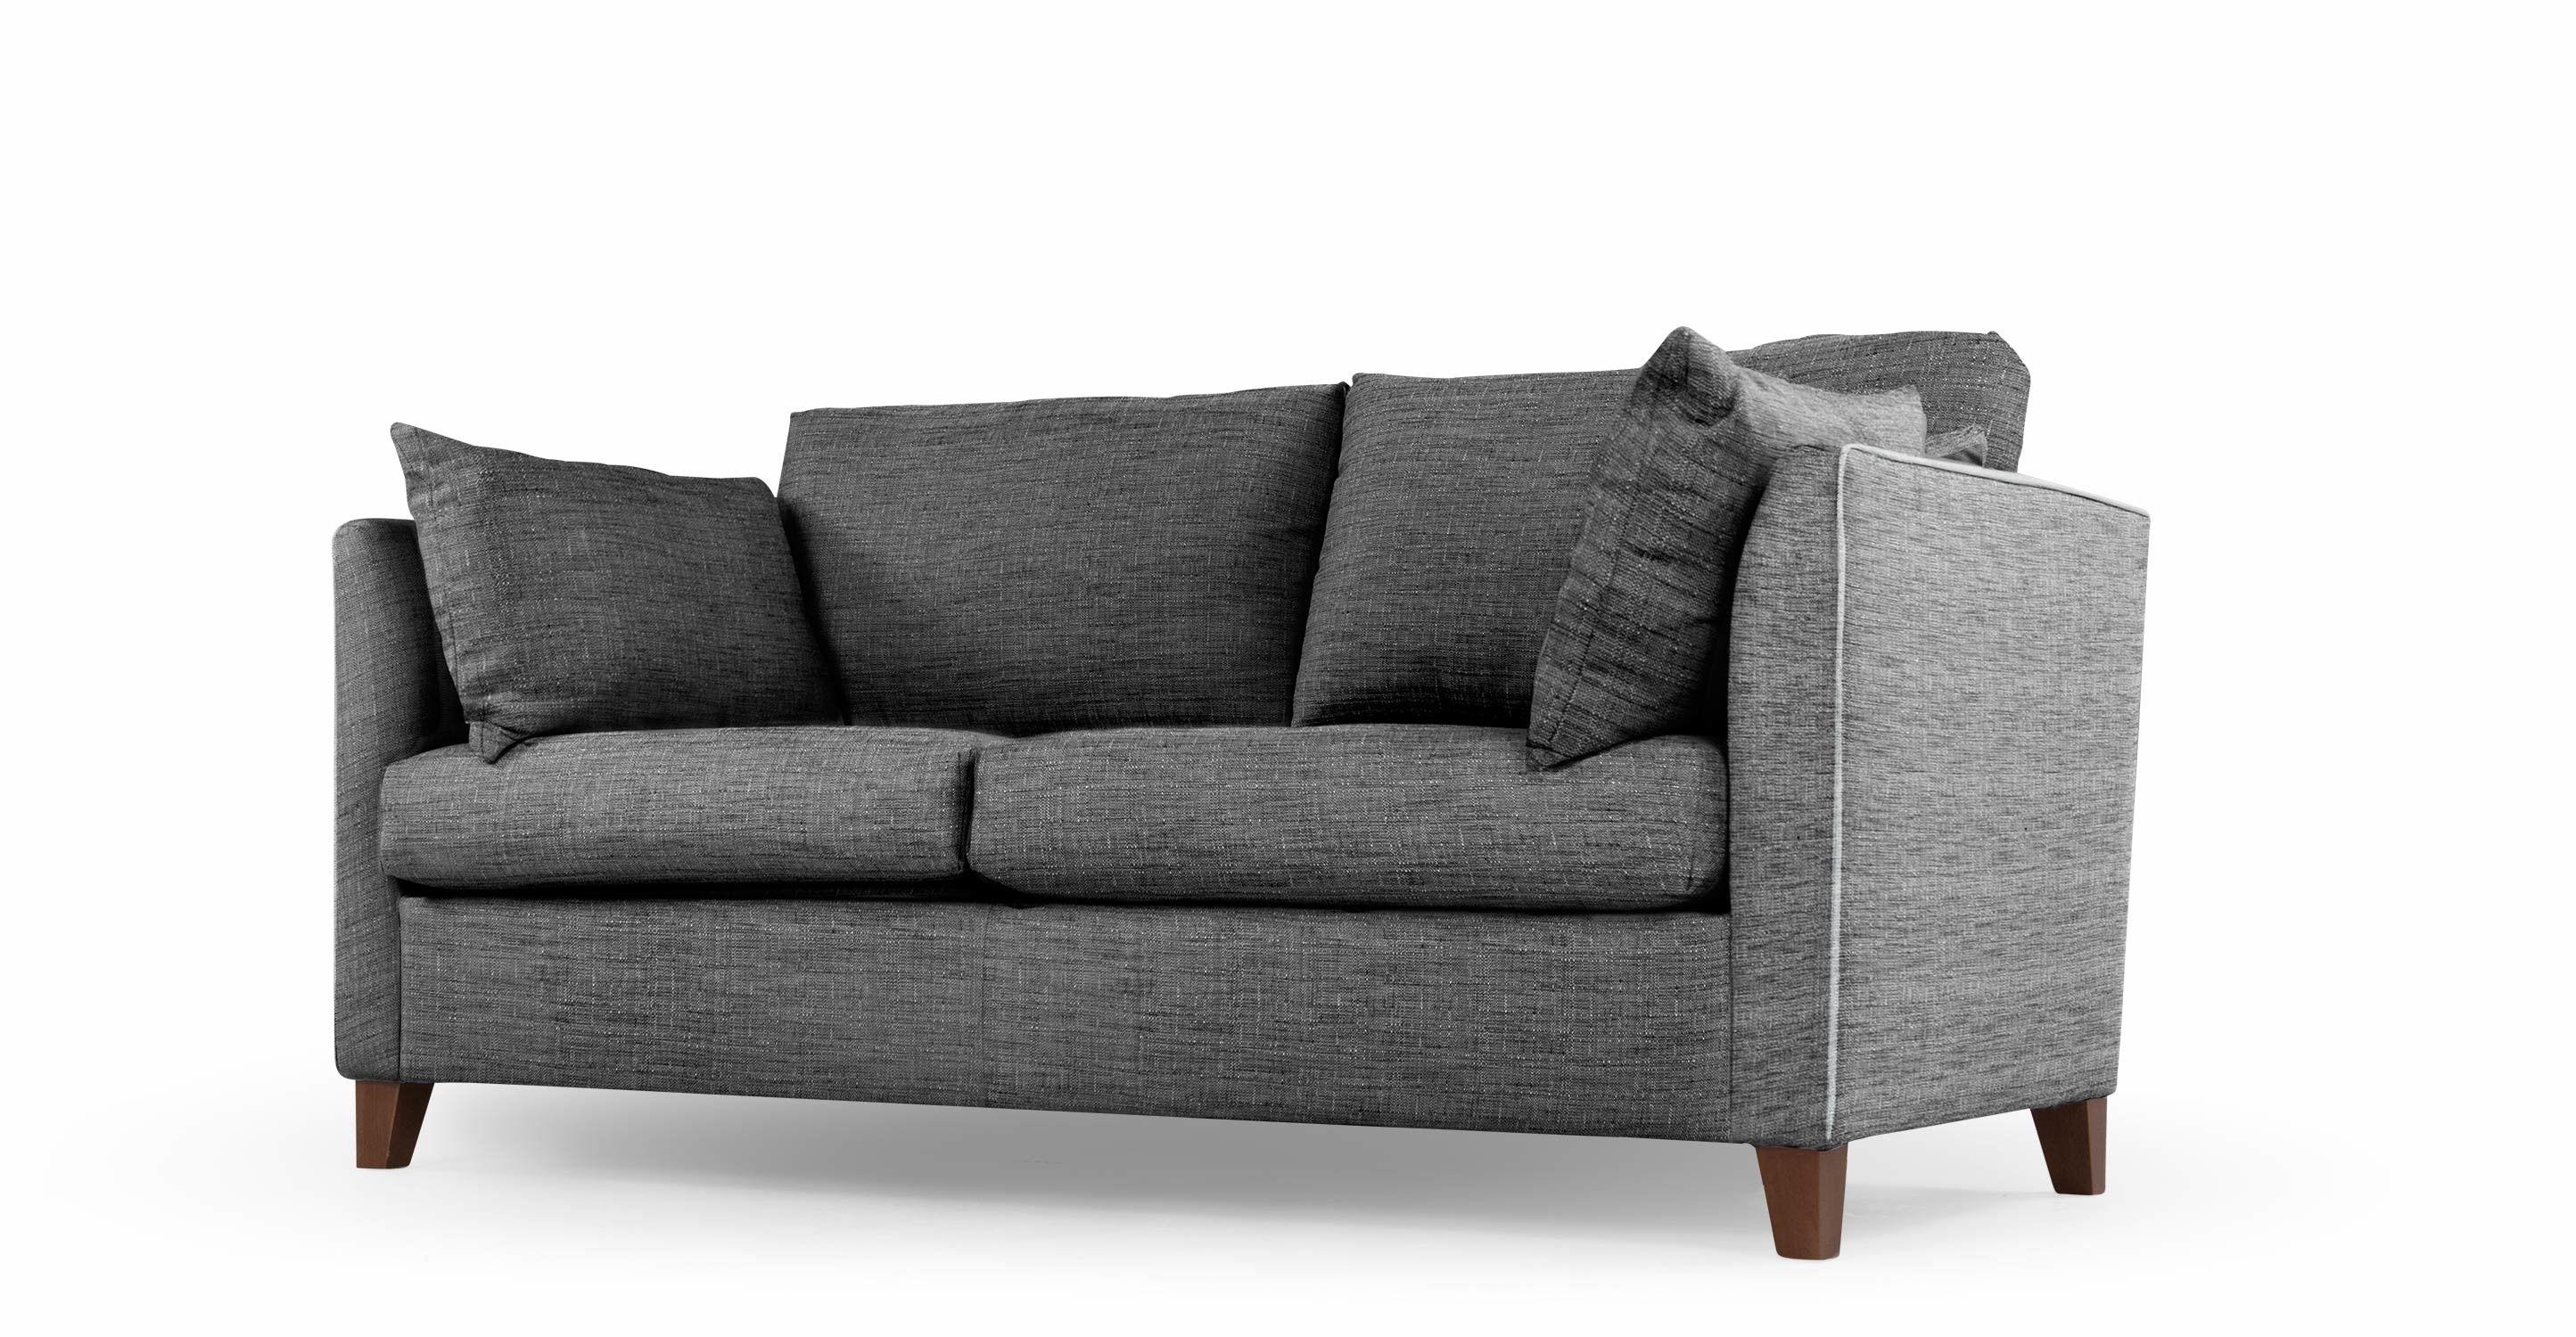 Bari Canape Lit Matelas A Memoire De Forme Gris Graphite Sofa Bed Habitat Sofa Bed Sofa